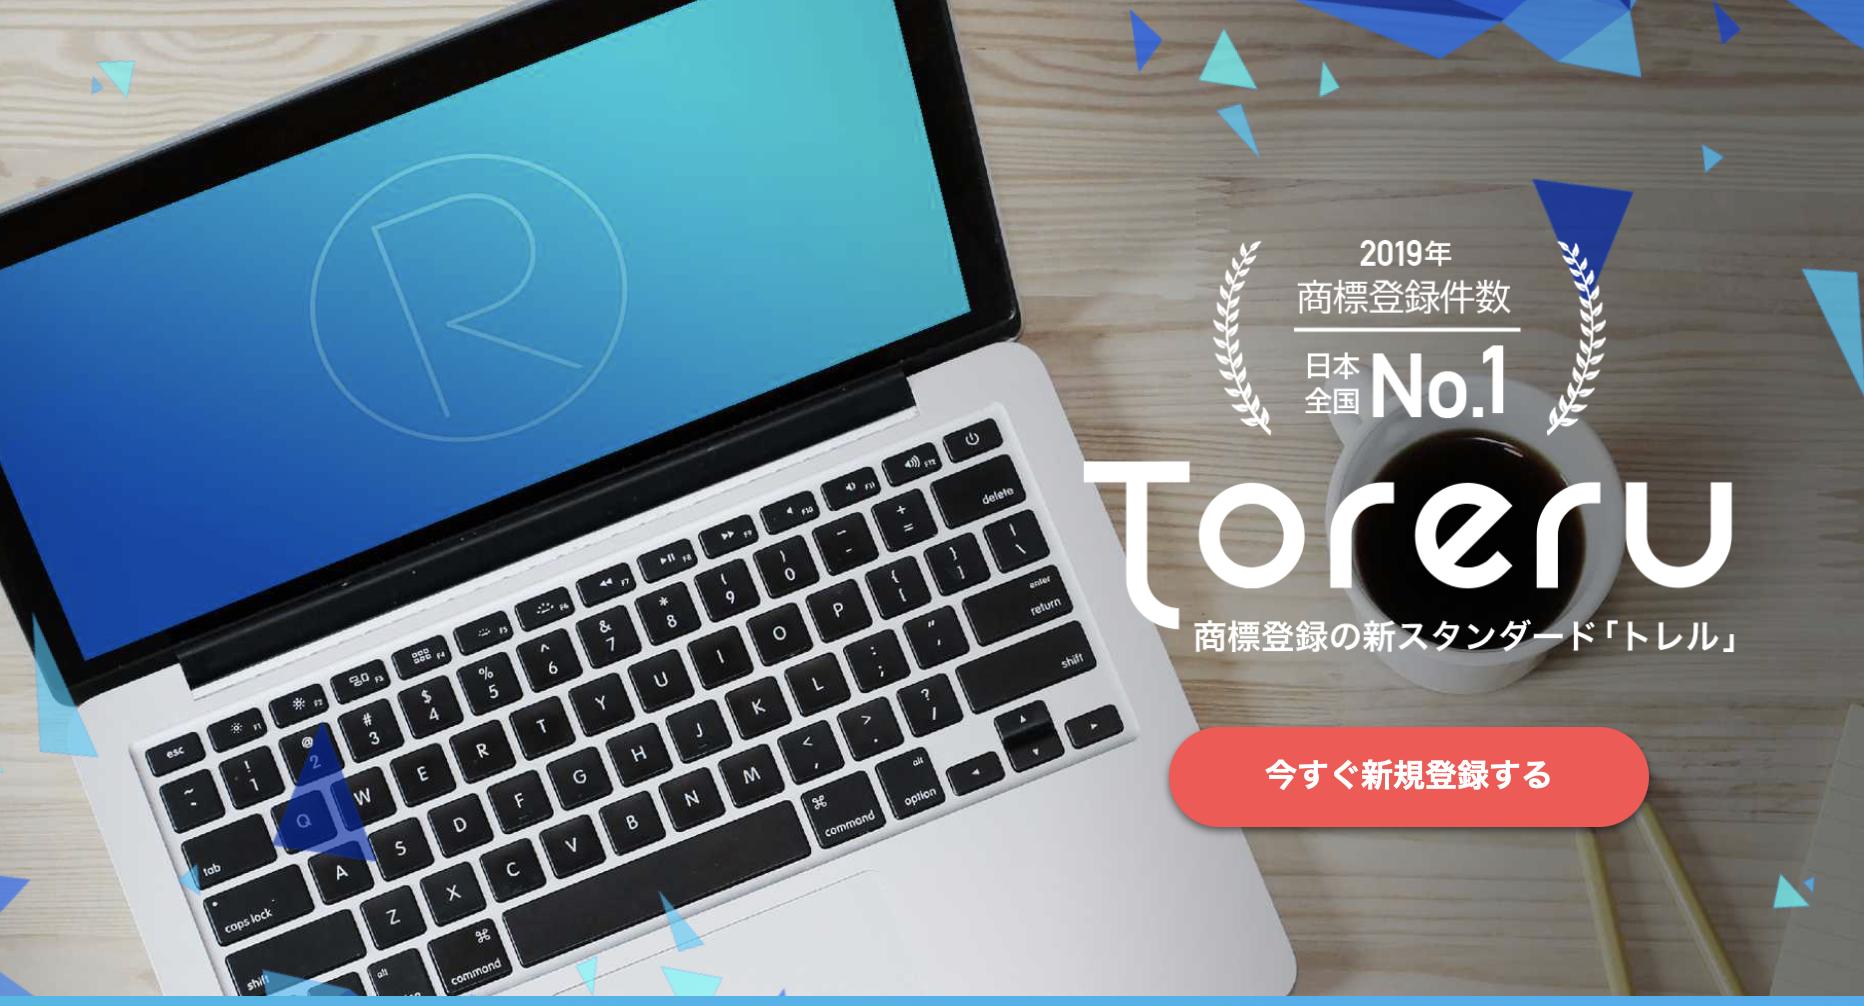 UI/UX・Webデザイナー募集! UXを重視するオンライン商標登録サービス「Toreru」